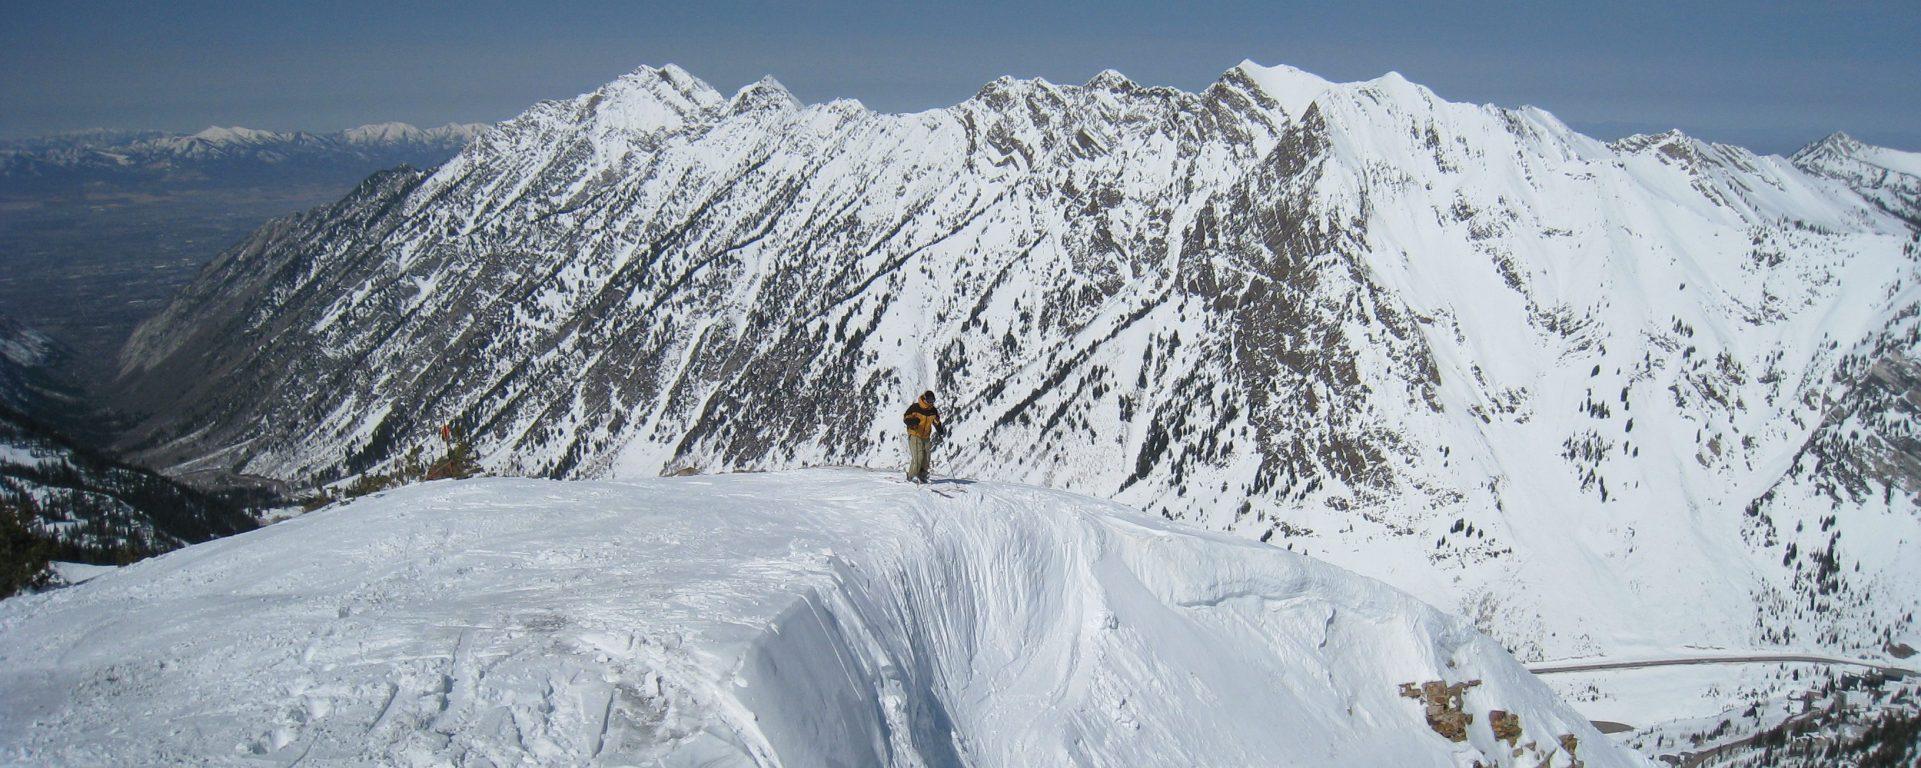 Mount Baldy's Main Chute